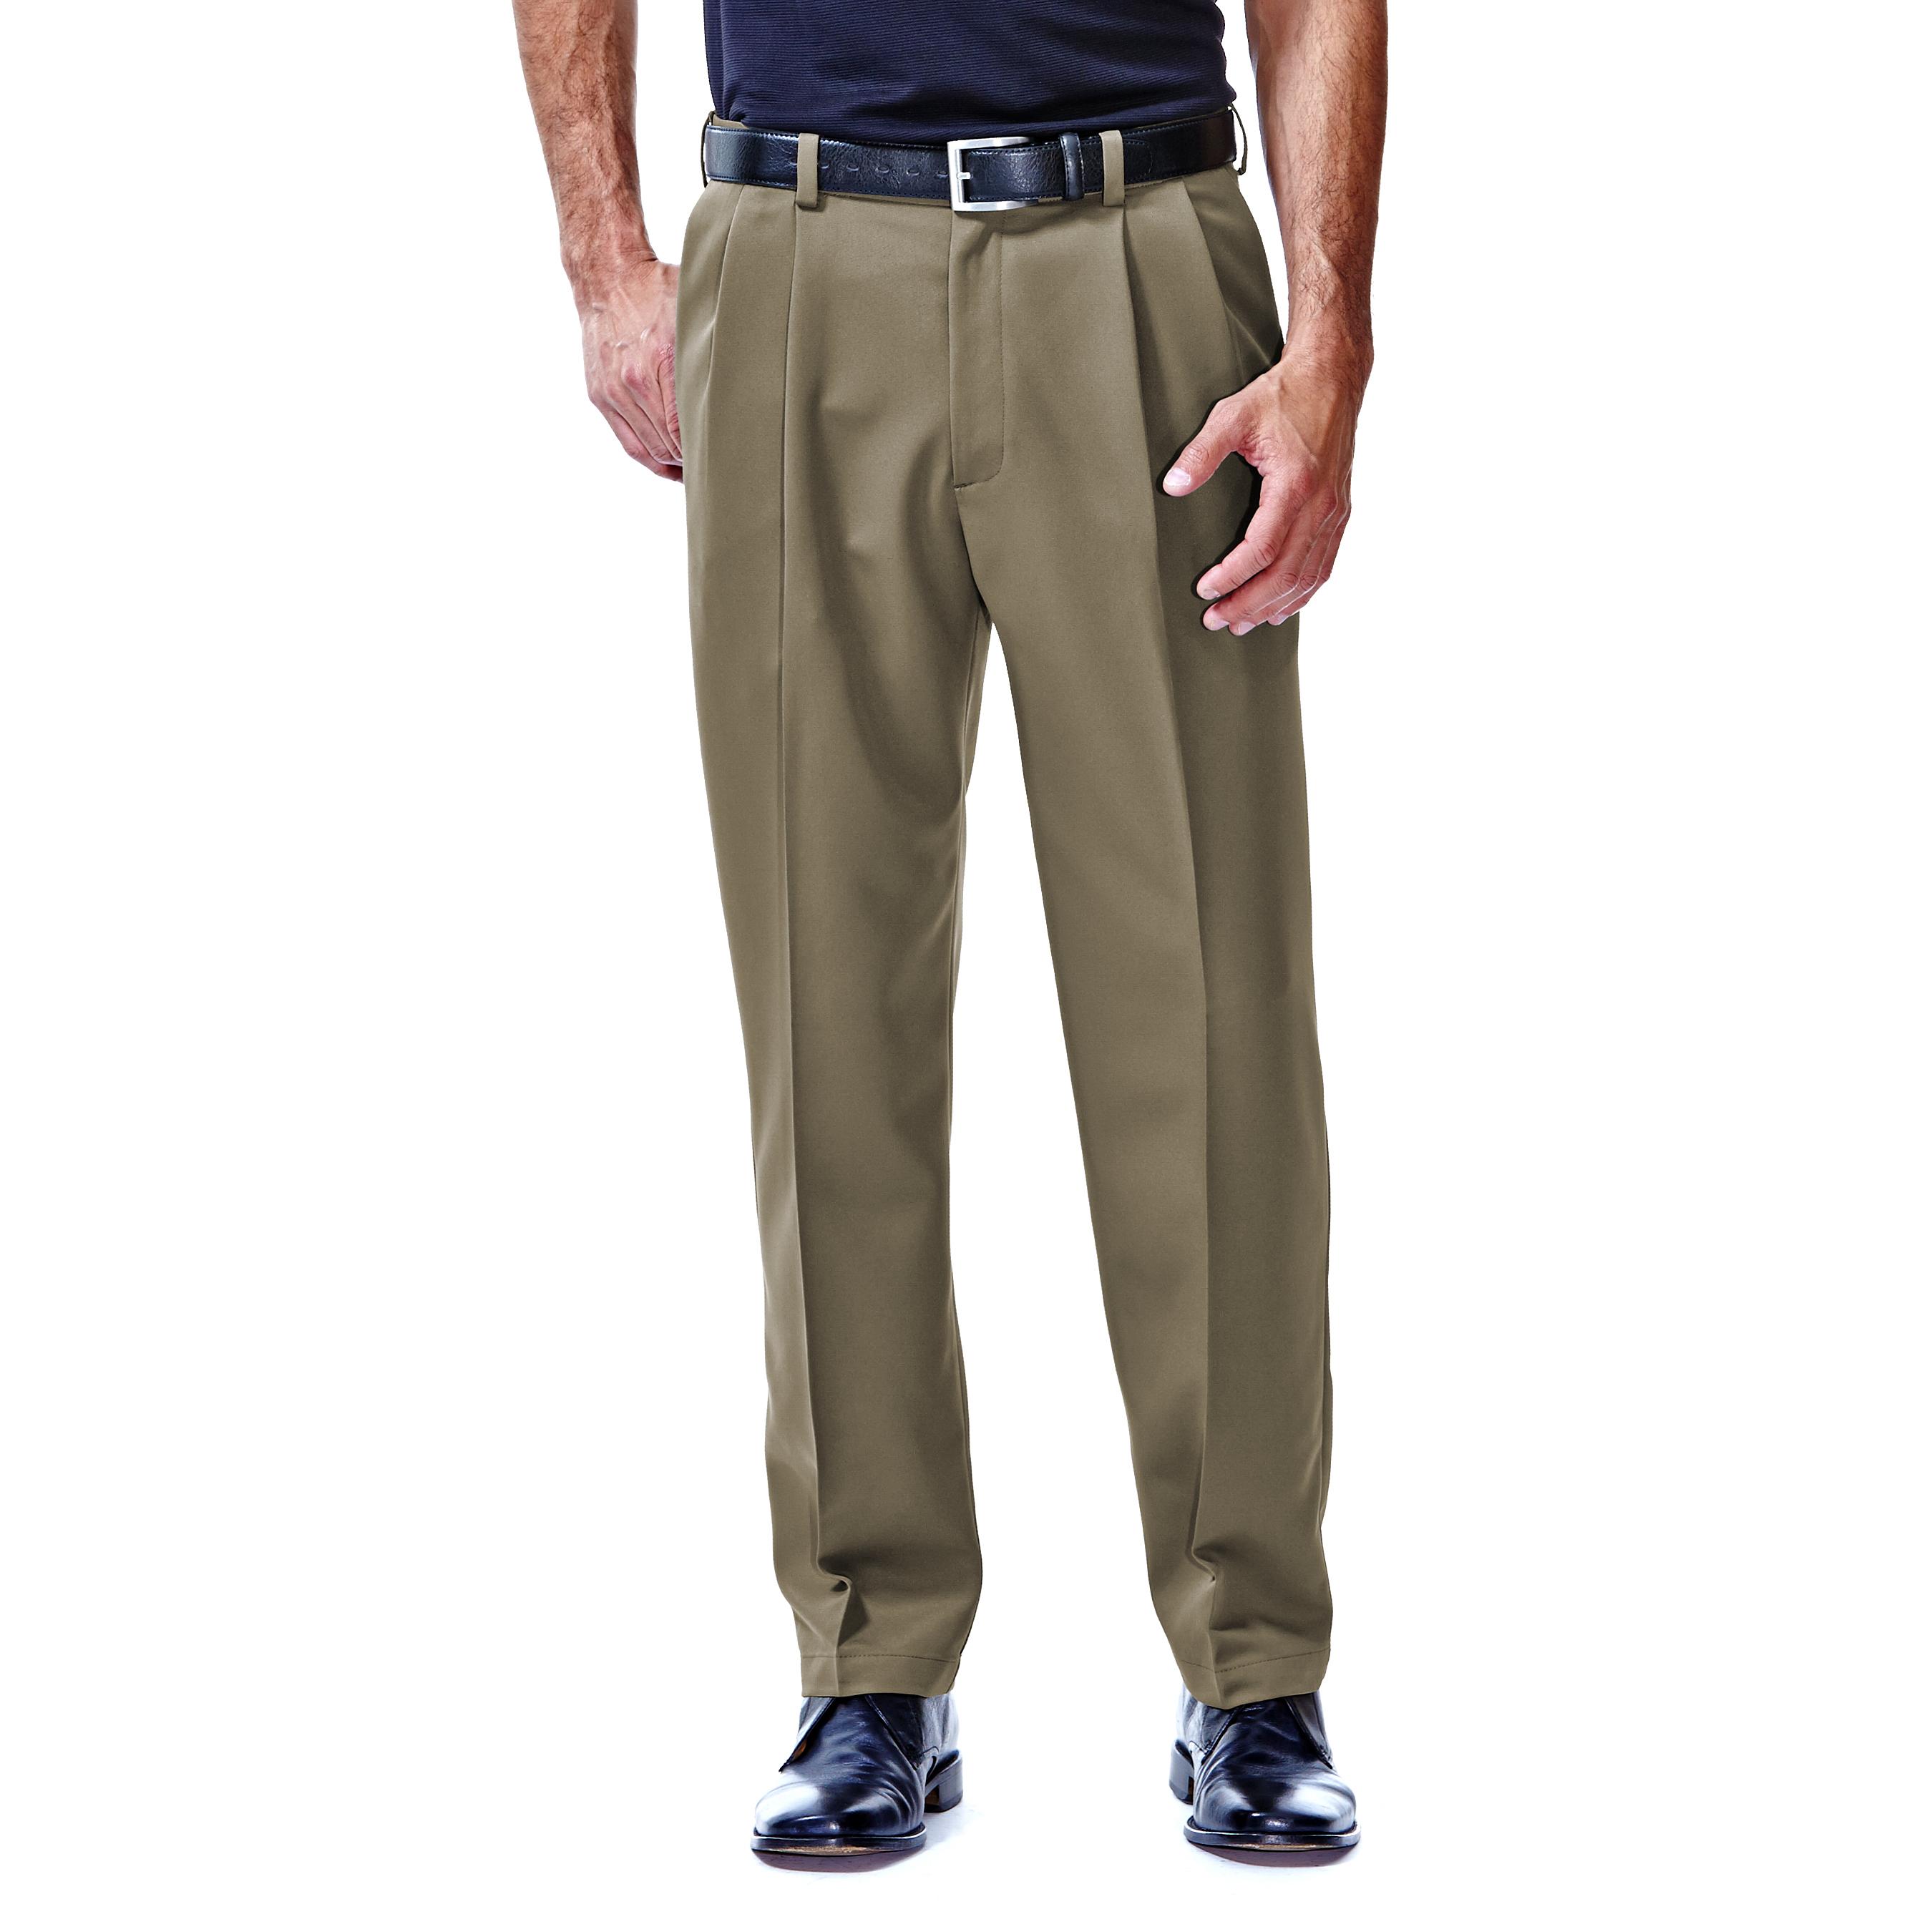 haggar cool 18 pants review